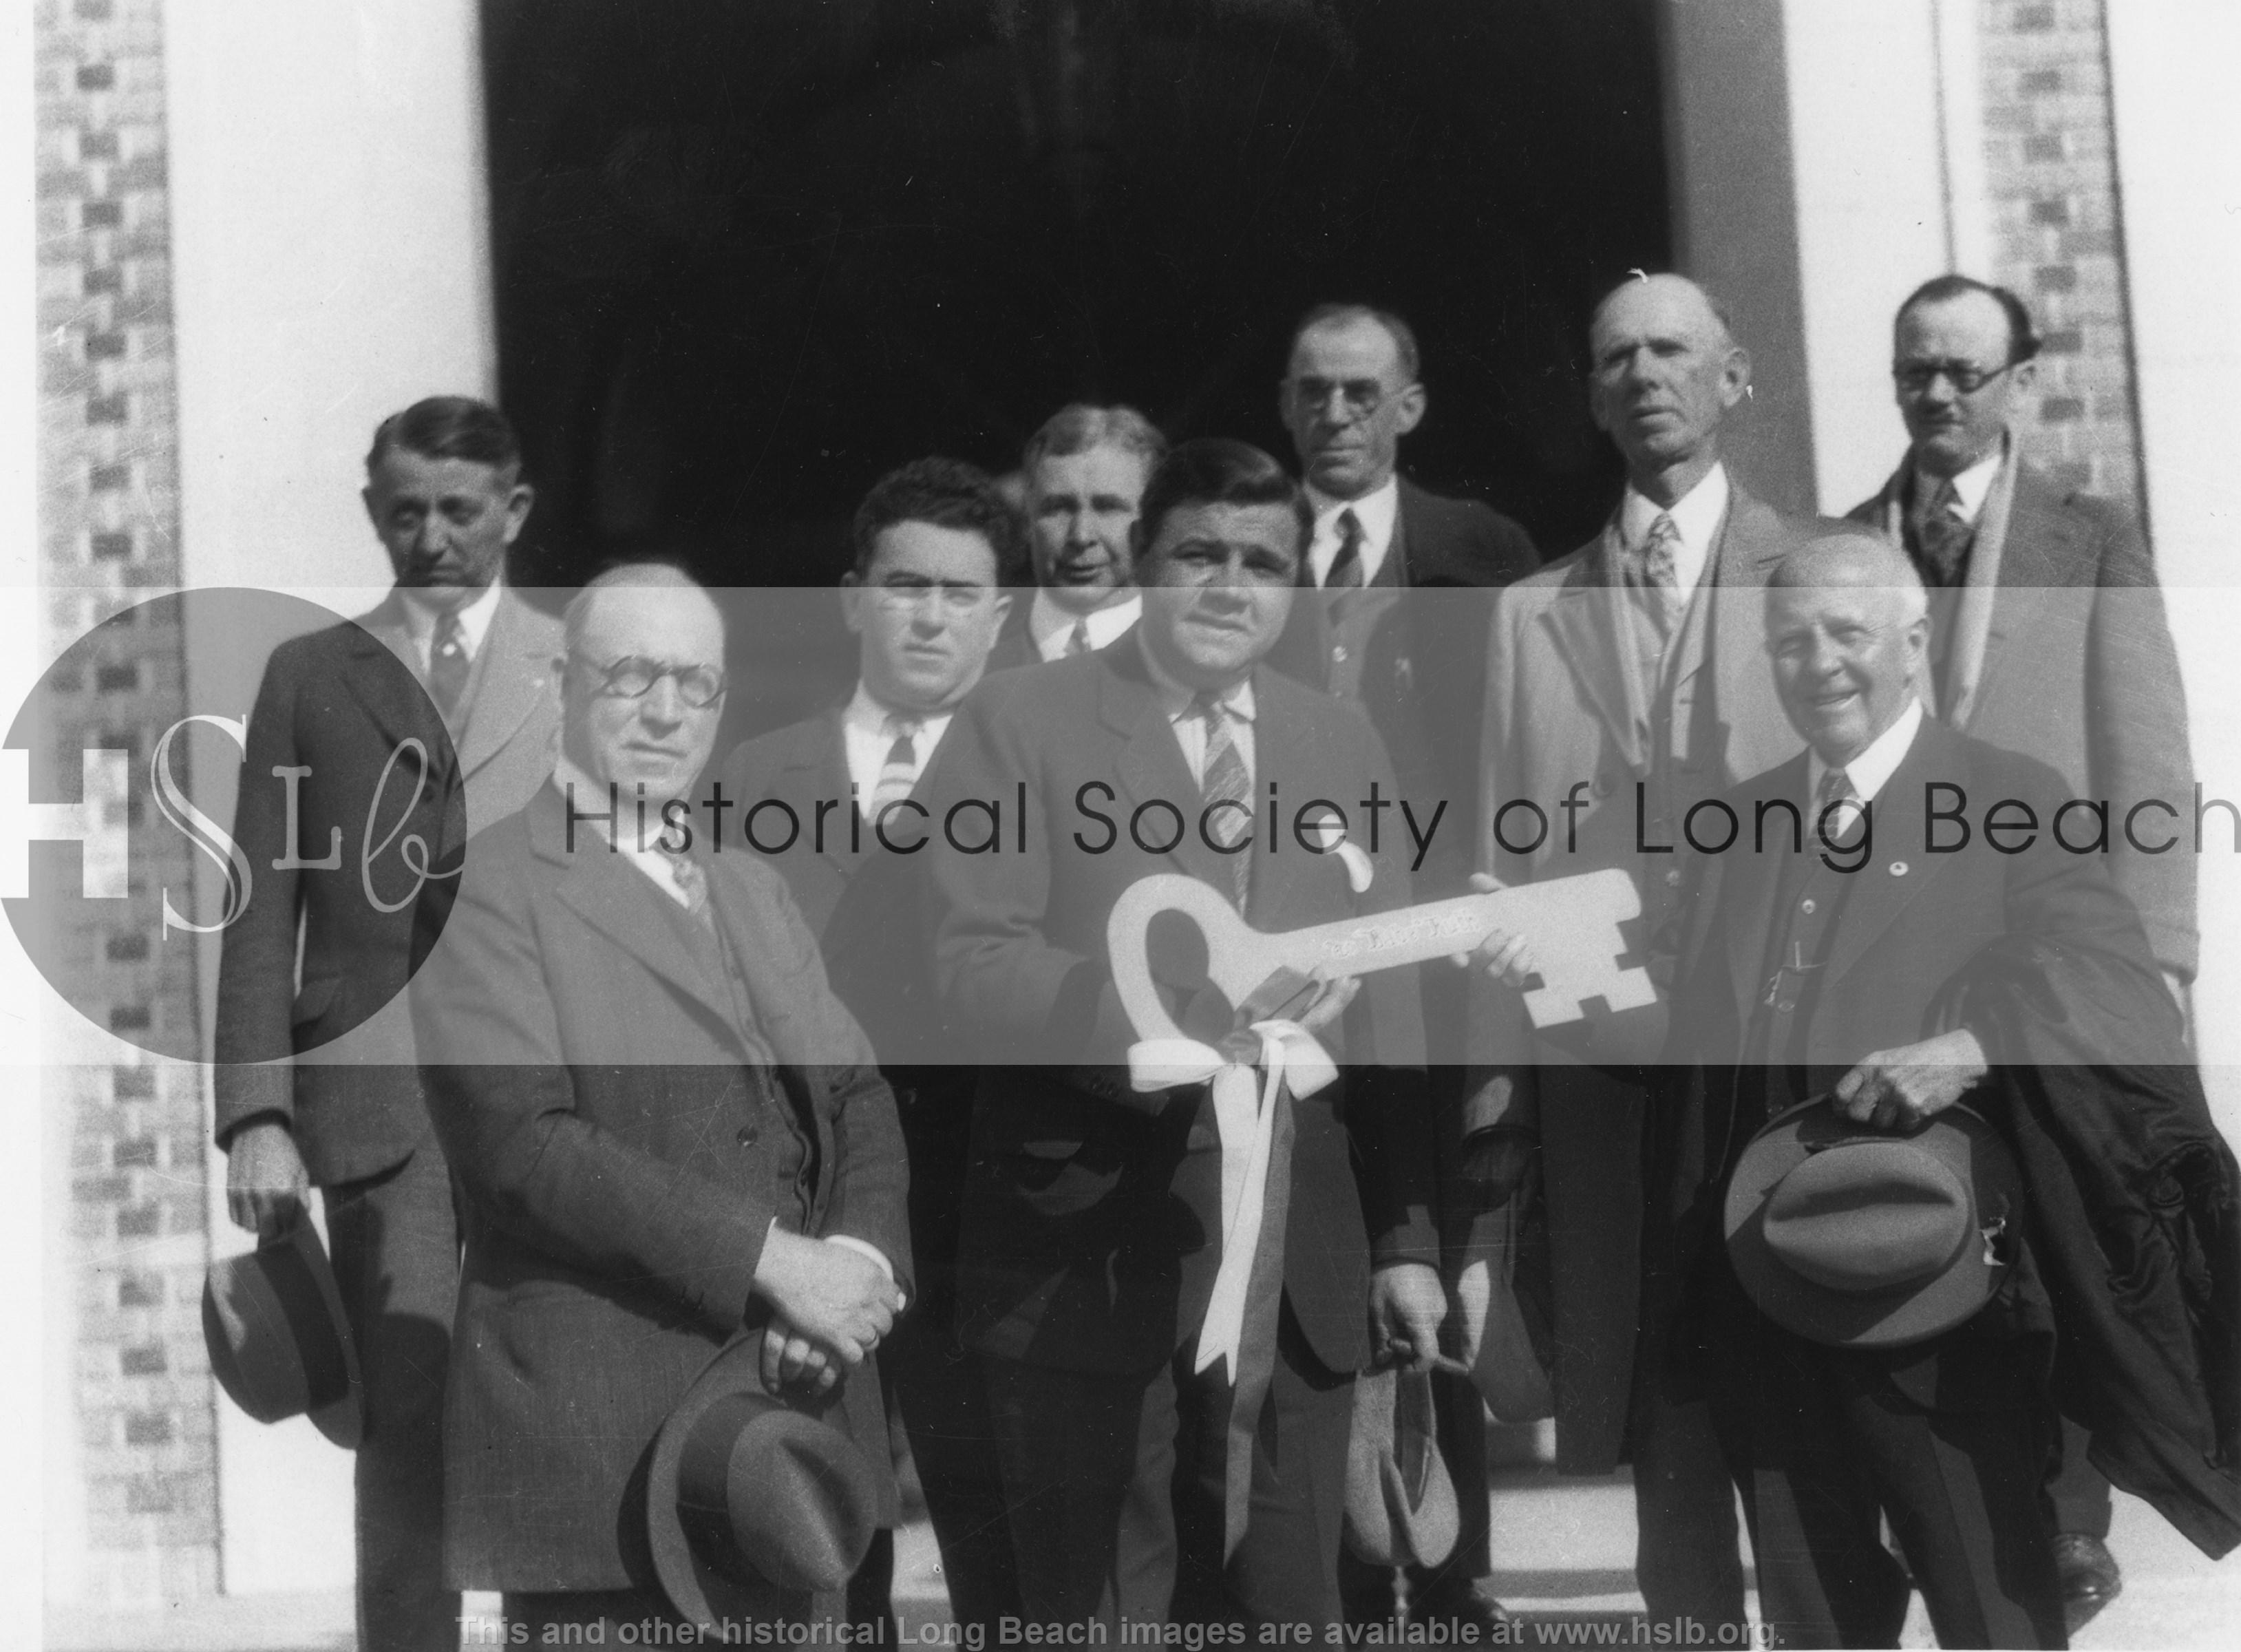 Babe Ruth & key to city, 1928 historical photo